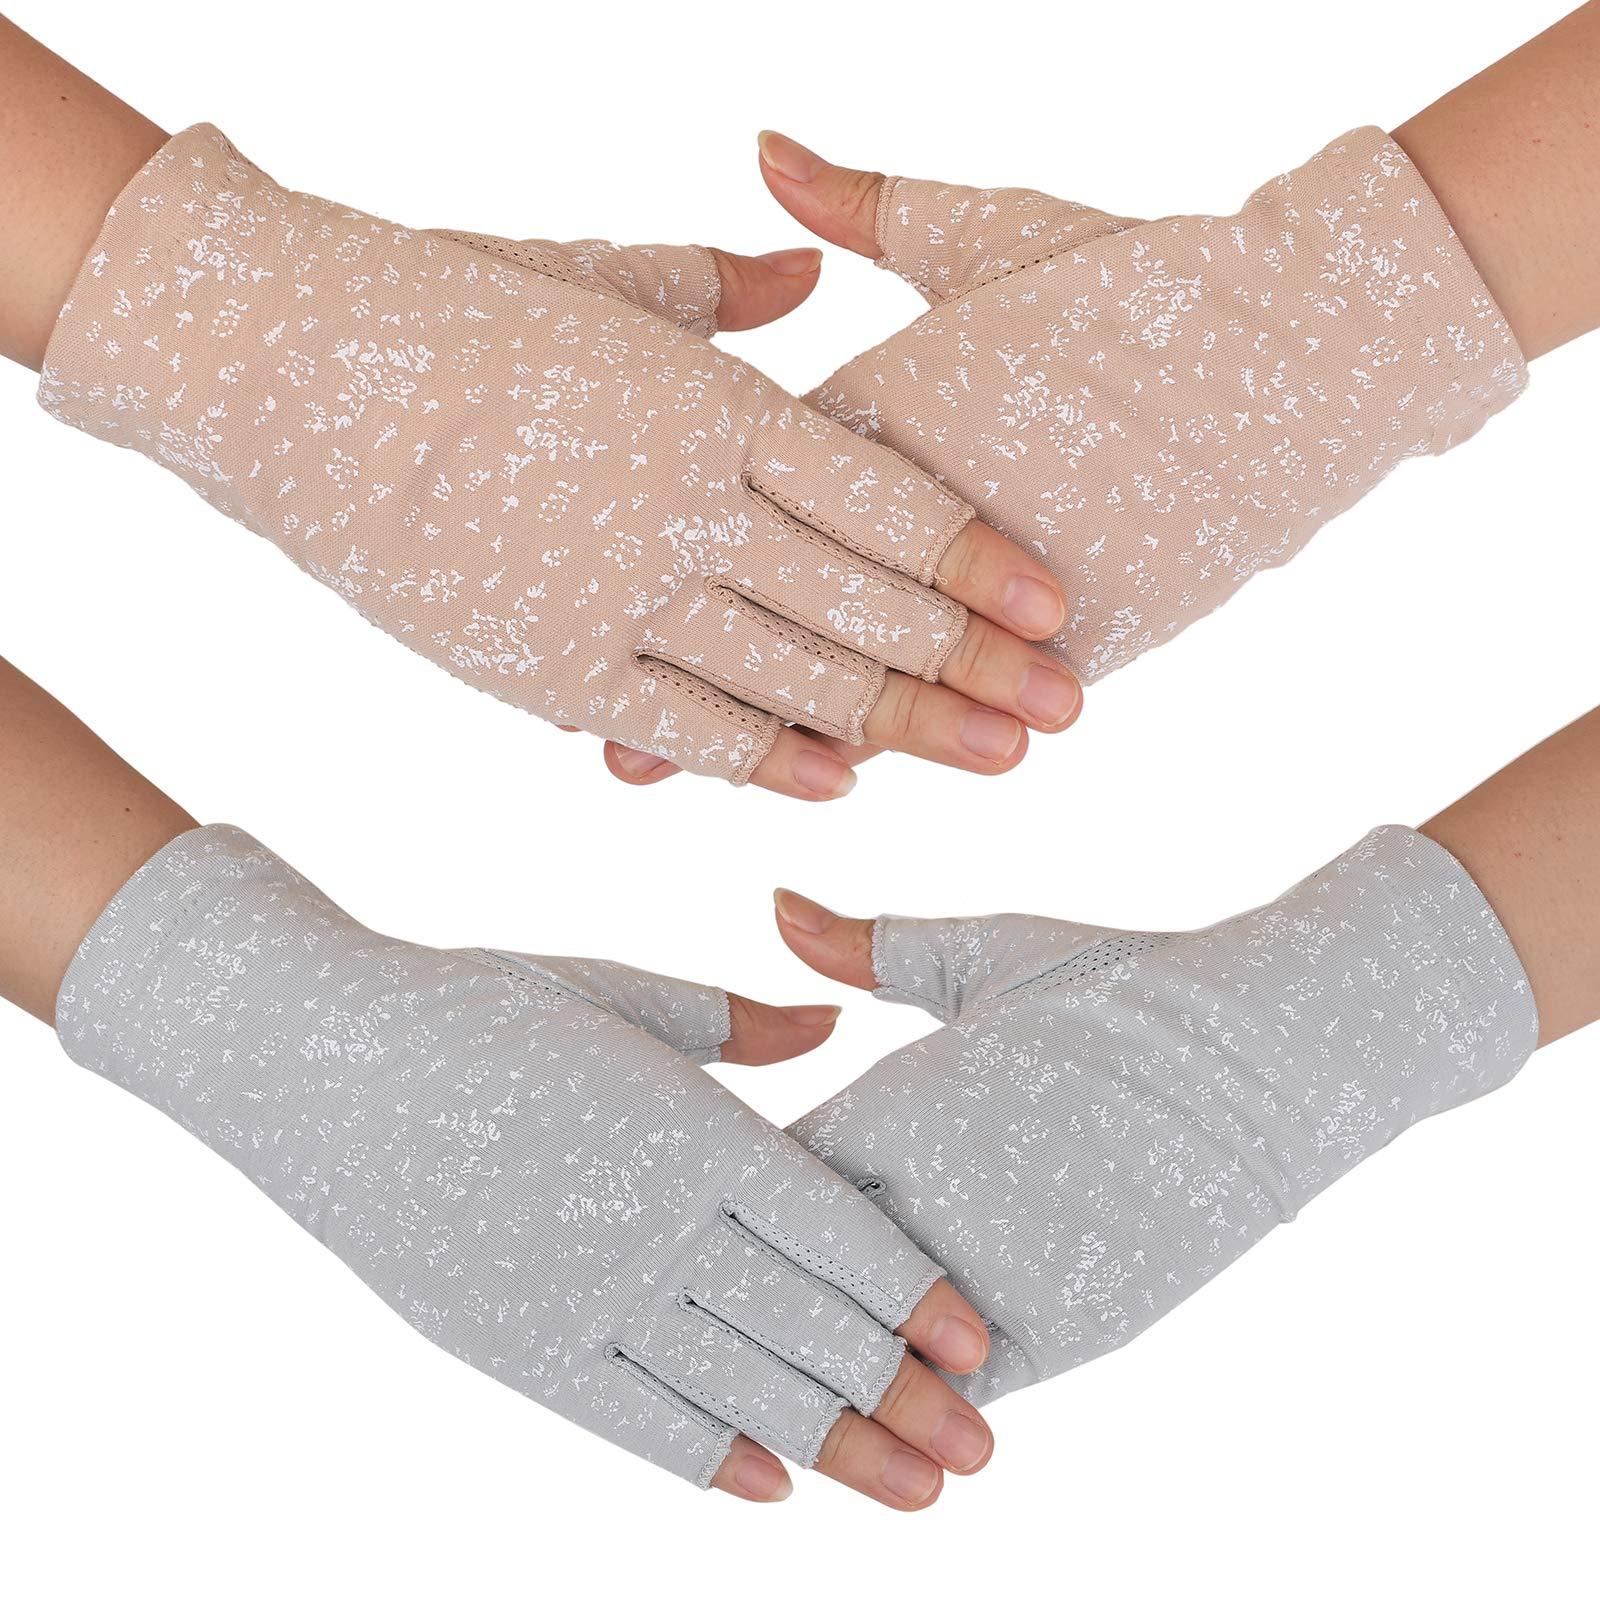 Flammi Women's Fingerless Sun Gloves Non Skid Cotton Driving Gloves UV Protection (2 Pairs(Khaki+Grey)) by F Flammi